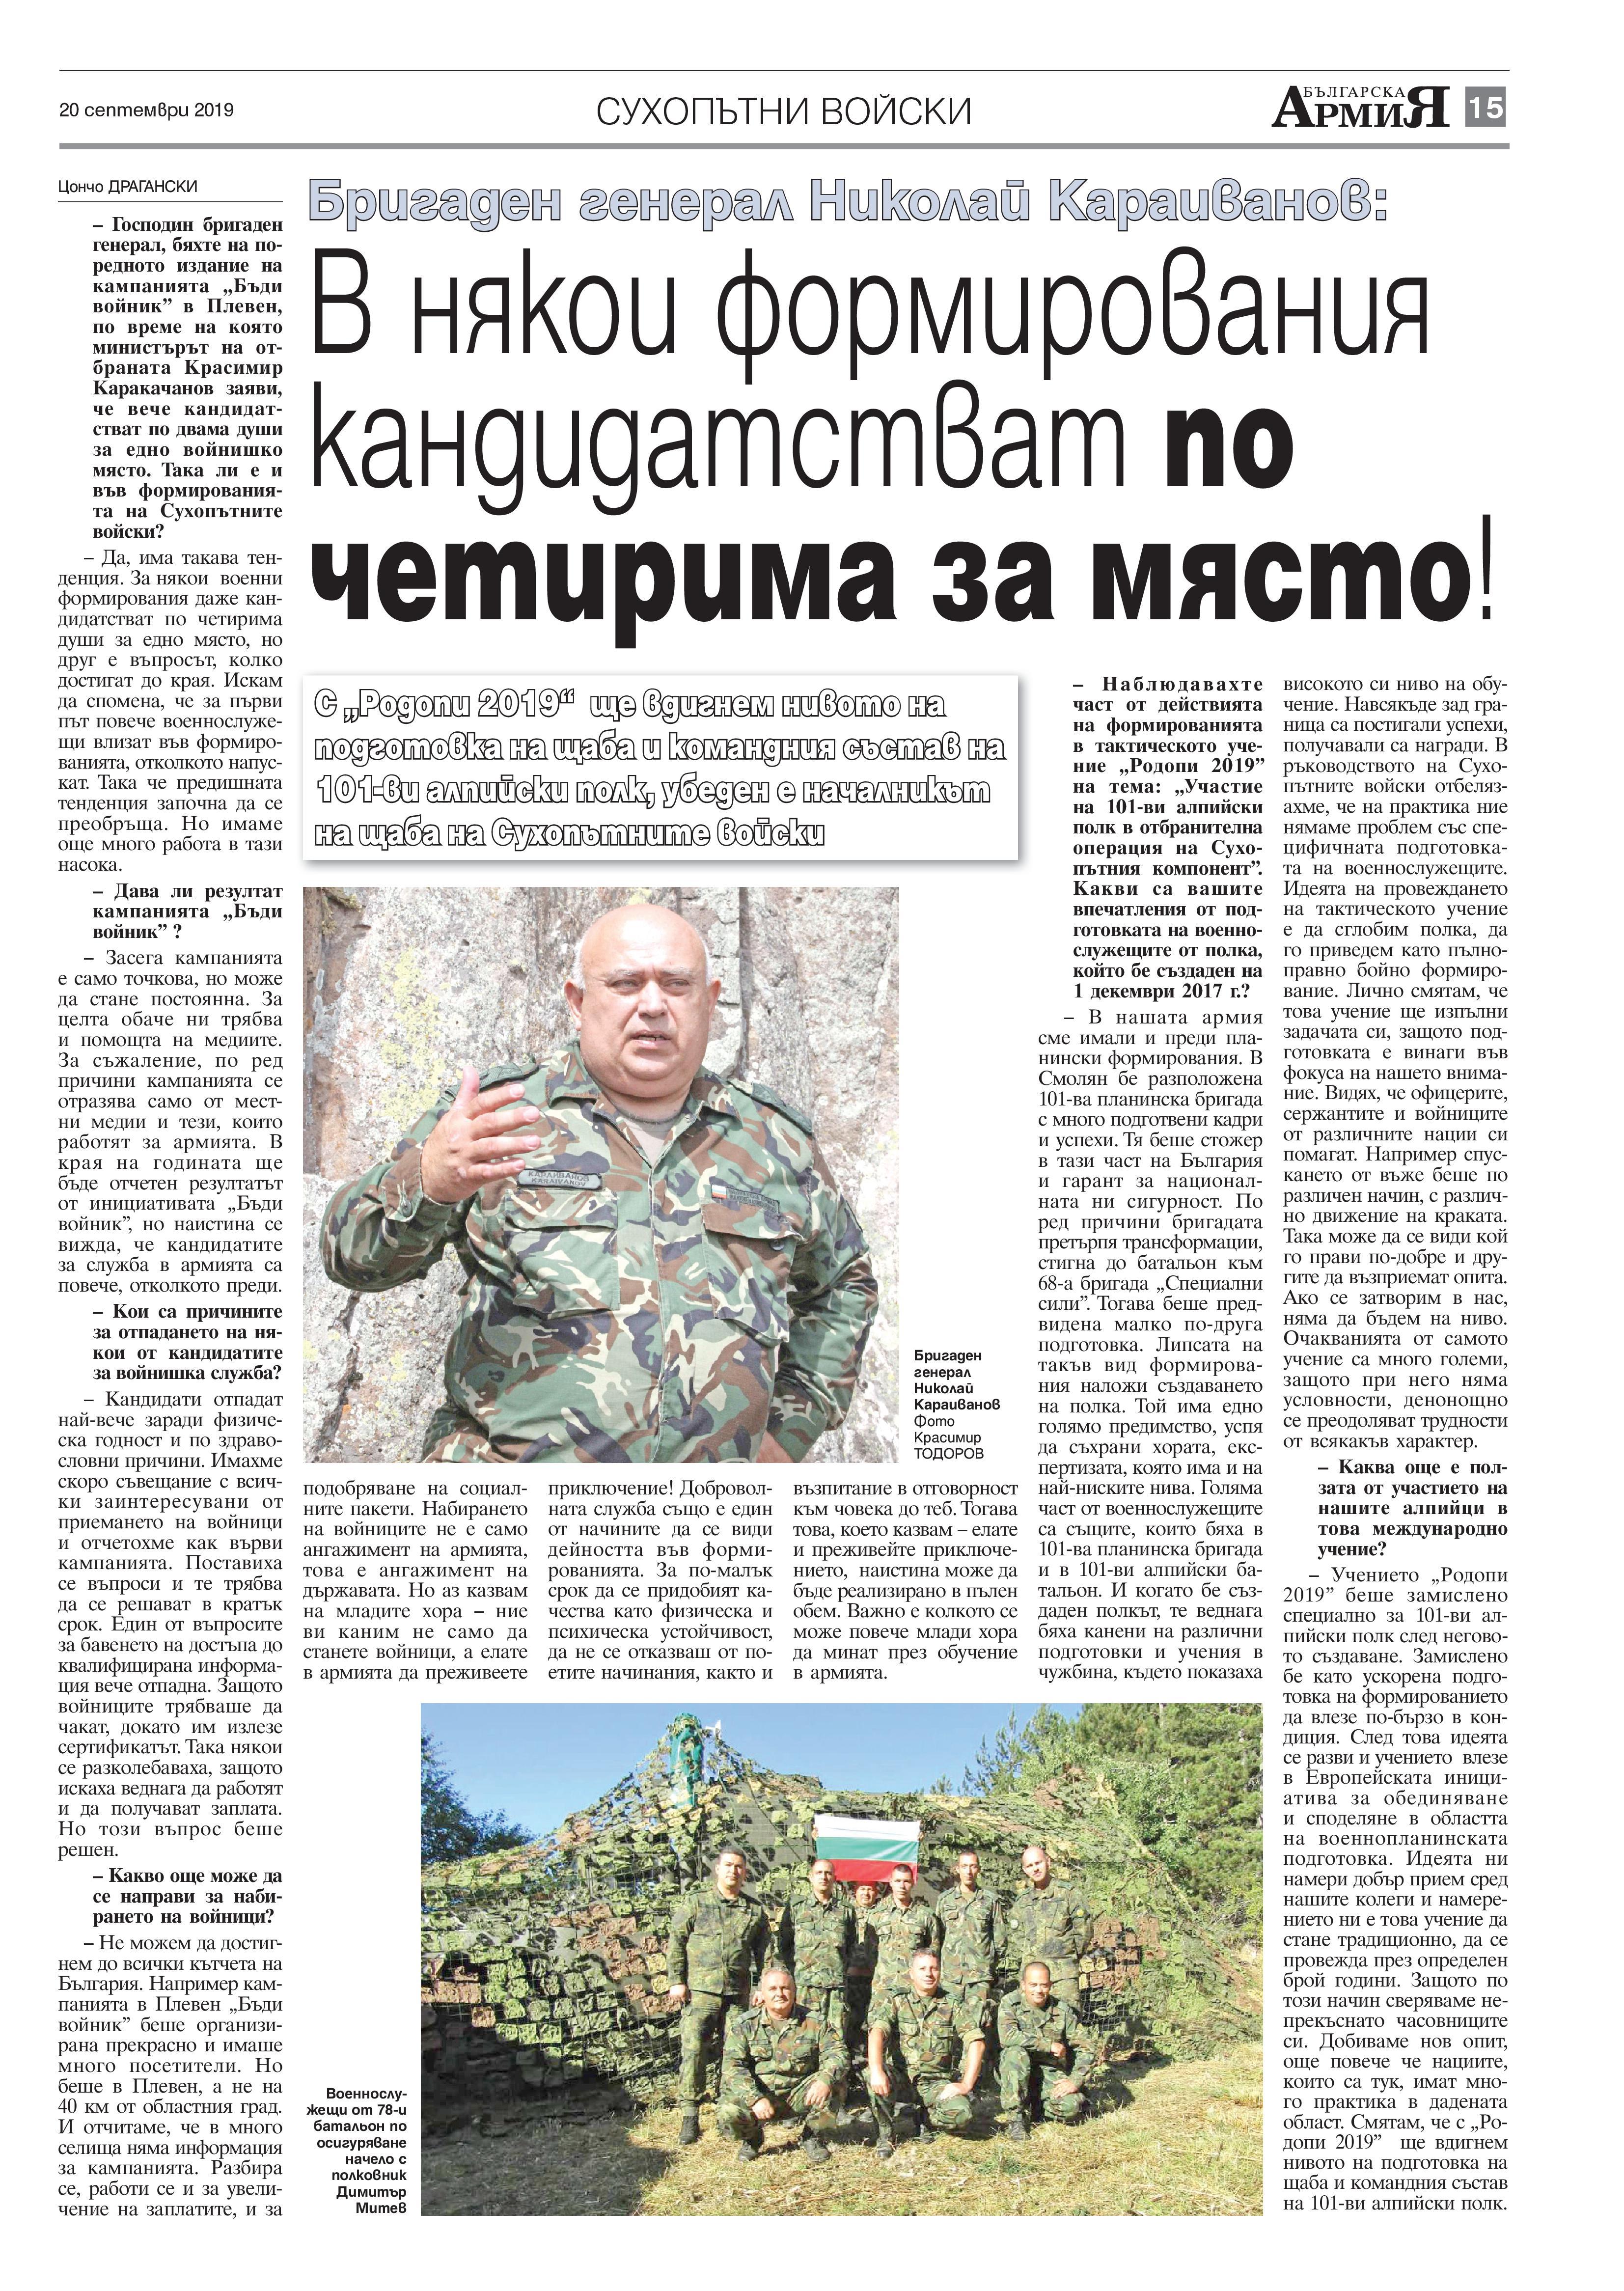 https://www.armymedia.bg/wp-content/uploads/2015/06/15-32.jpg